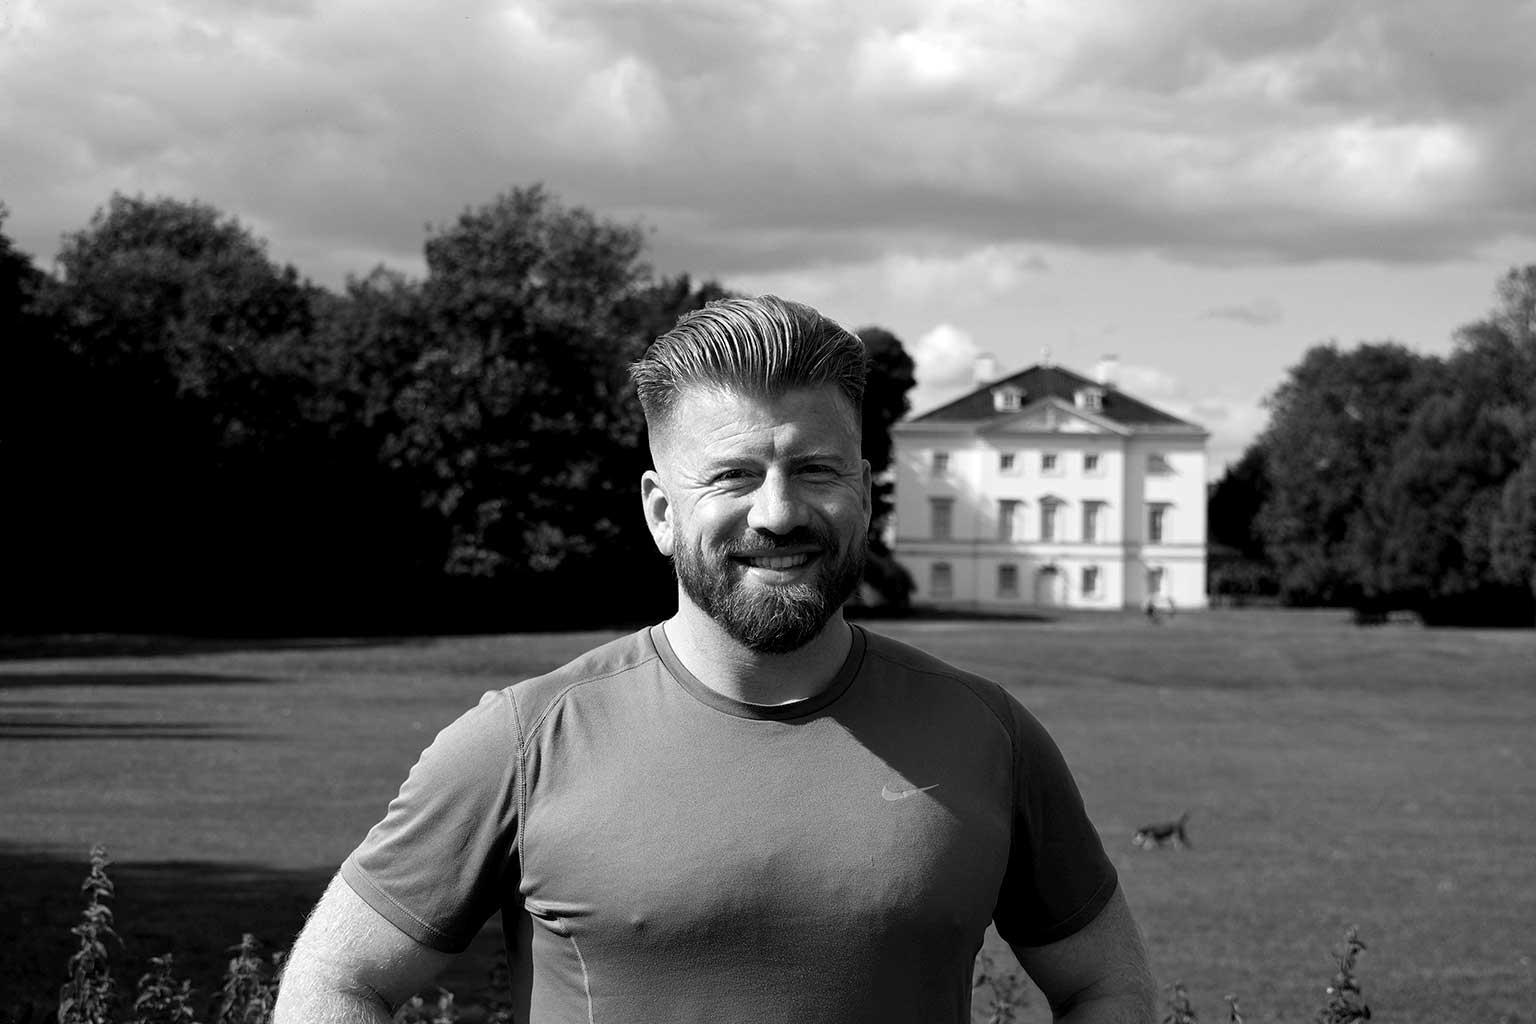 Alex Kenchington | The Health Minister | Twickenham